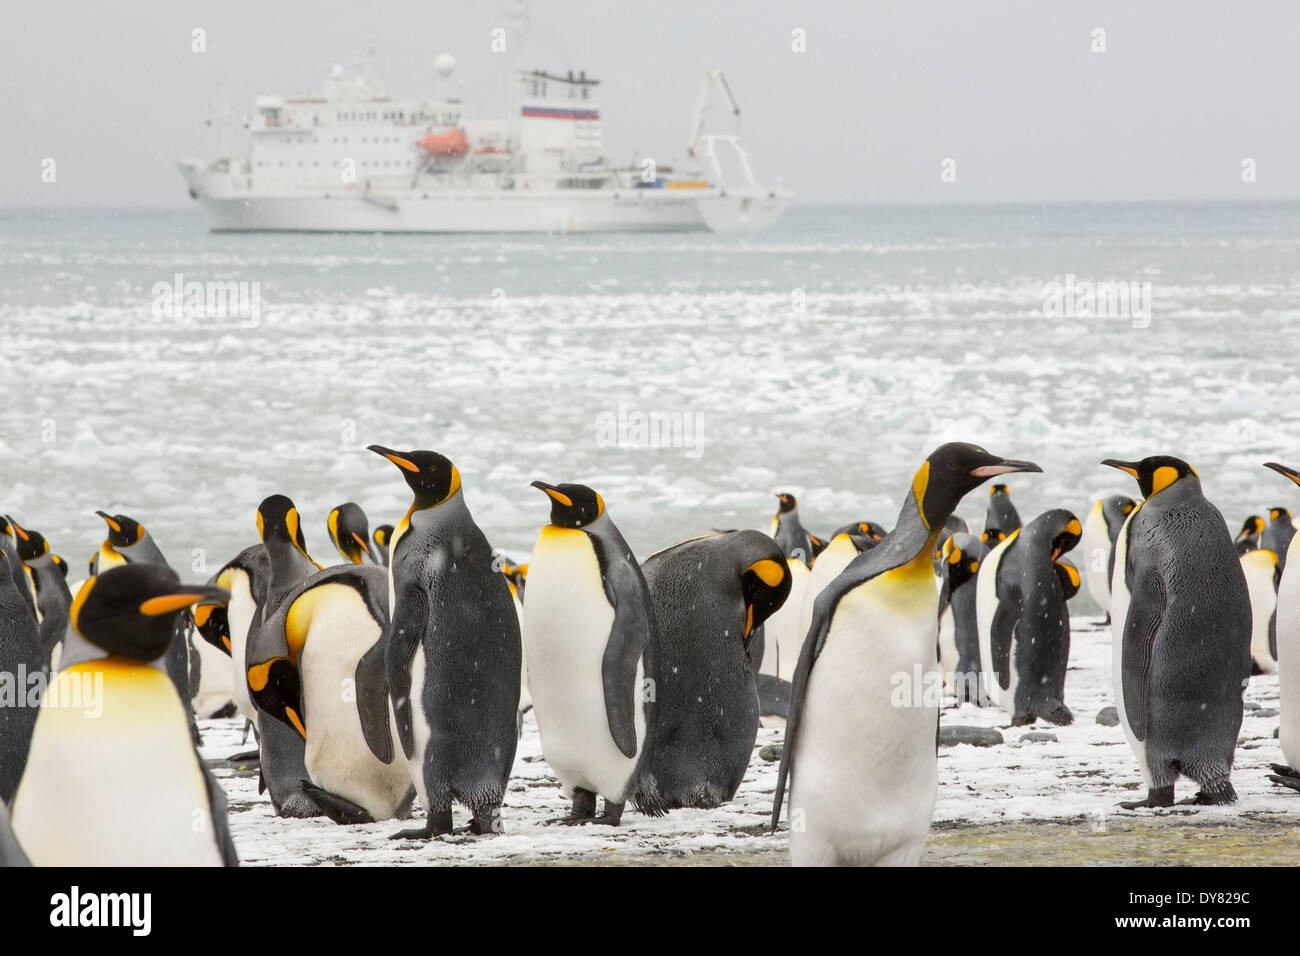 King Penguins at gold Harbor in South Georgia, Antarctica. - Stock Image